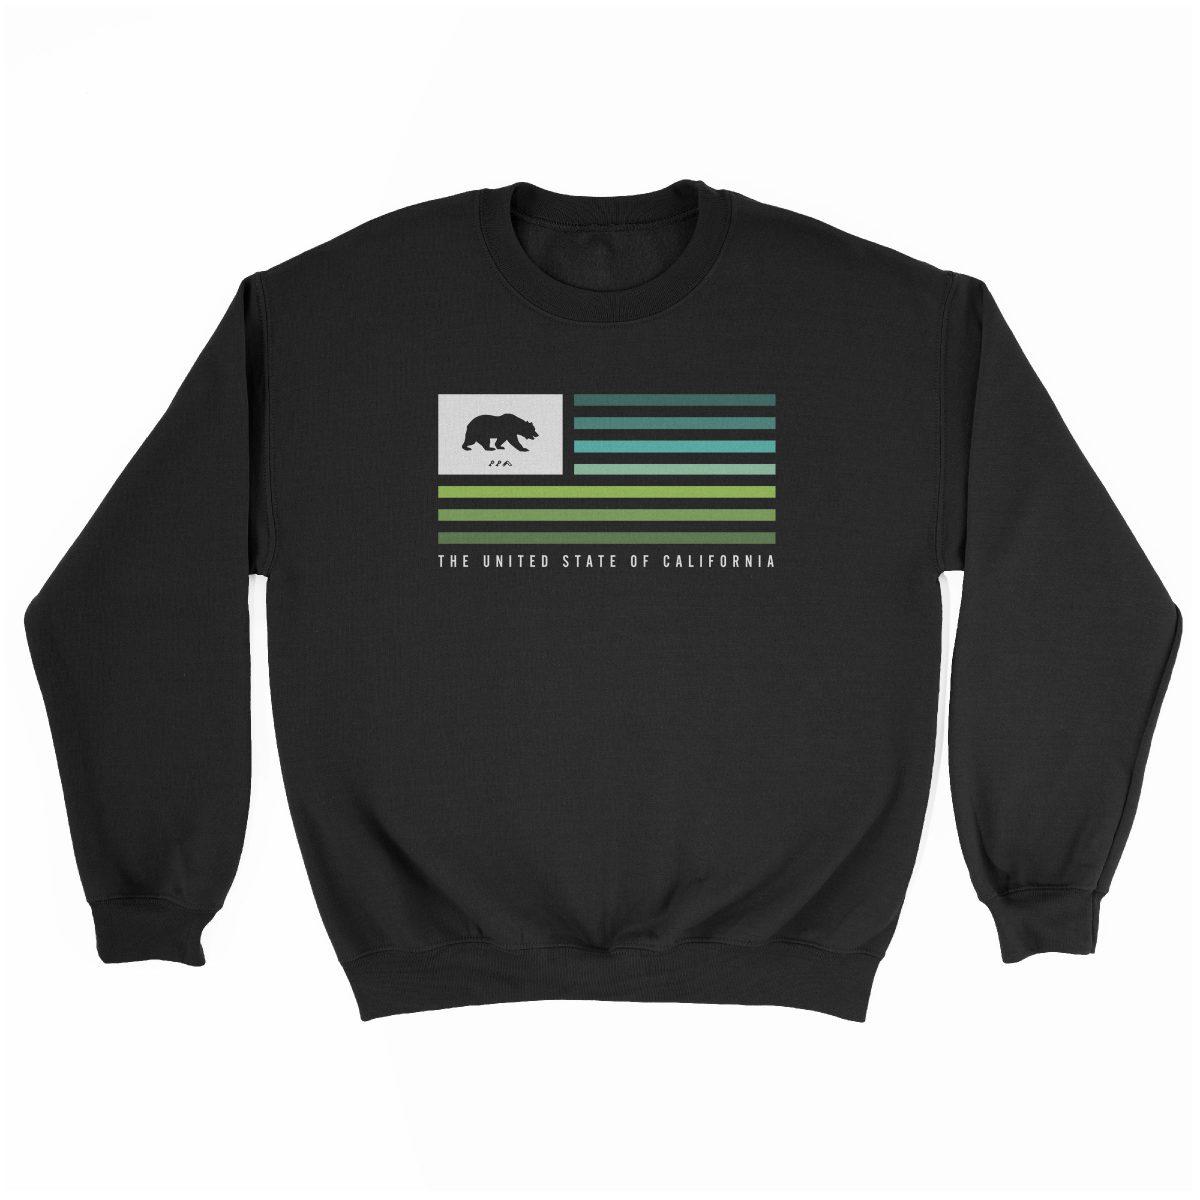 retro CALIFORNIA music festival cali summer beach sweatshirt in black